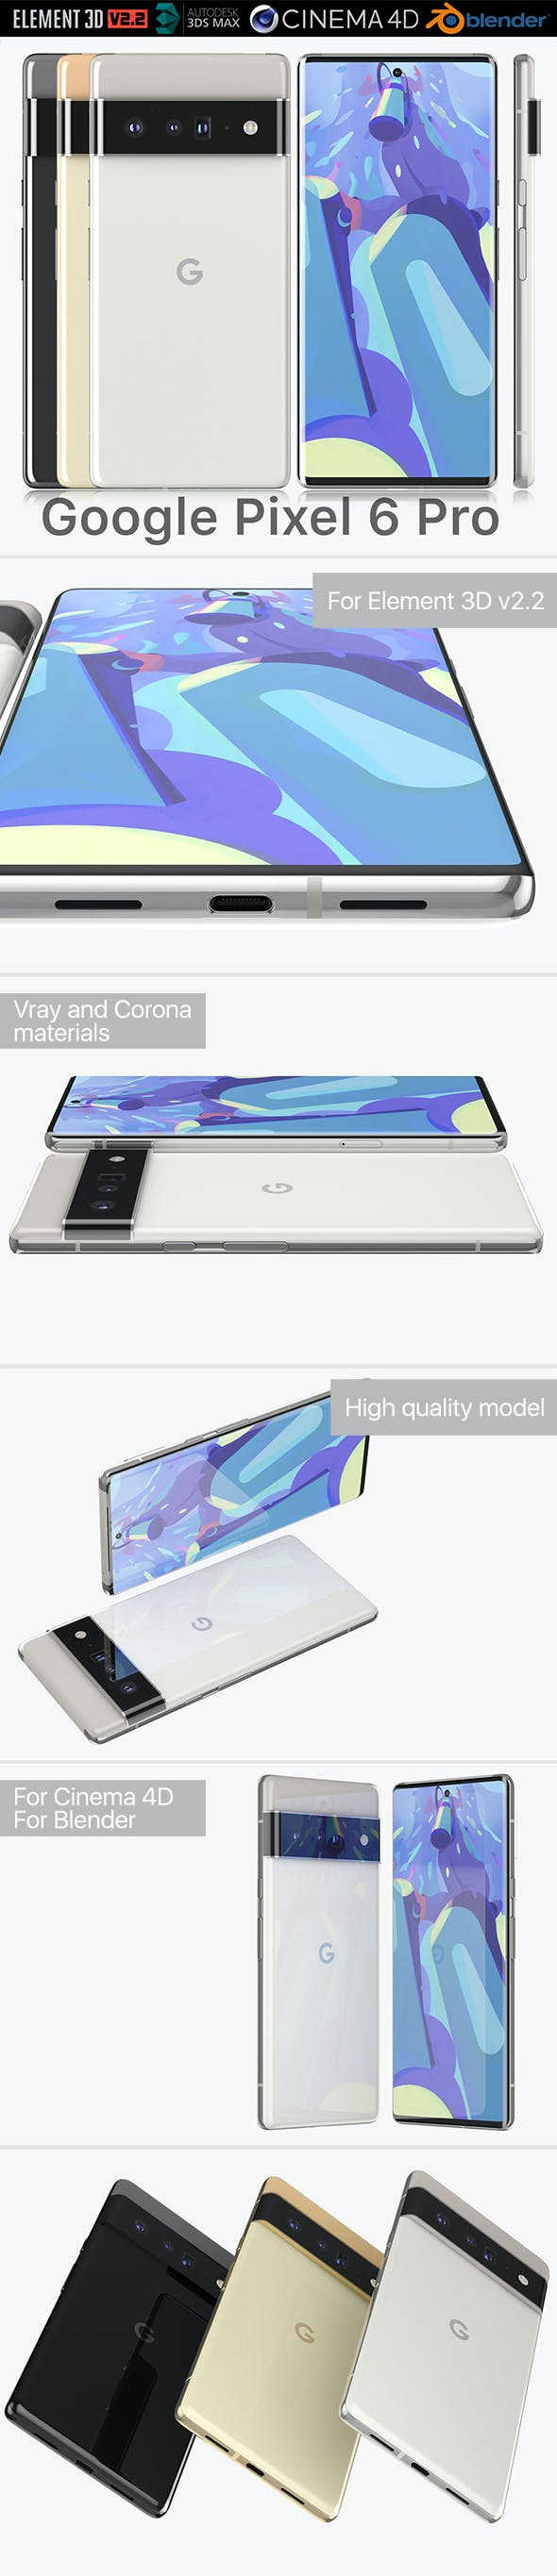 Google Pixel 6 Pro all colors - 3DOcean Item for Sale